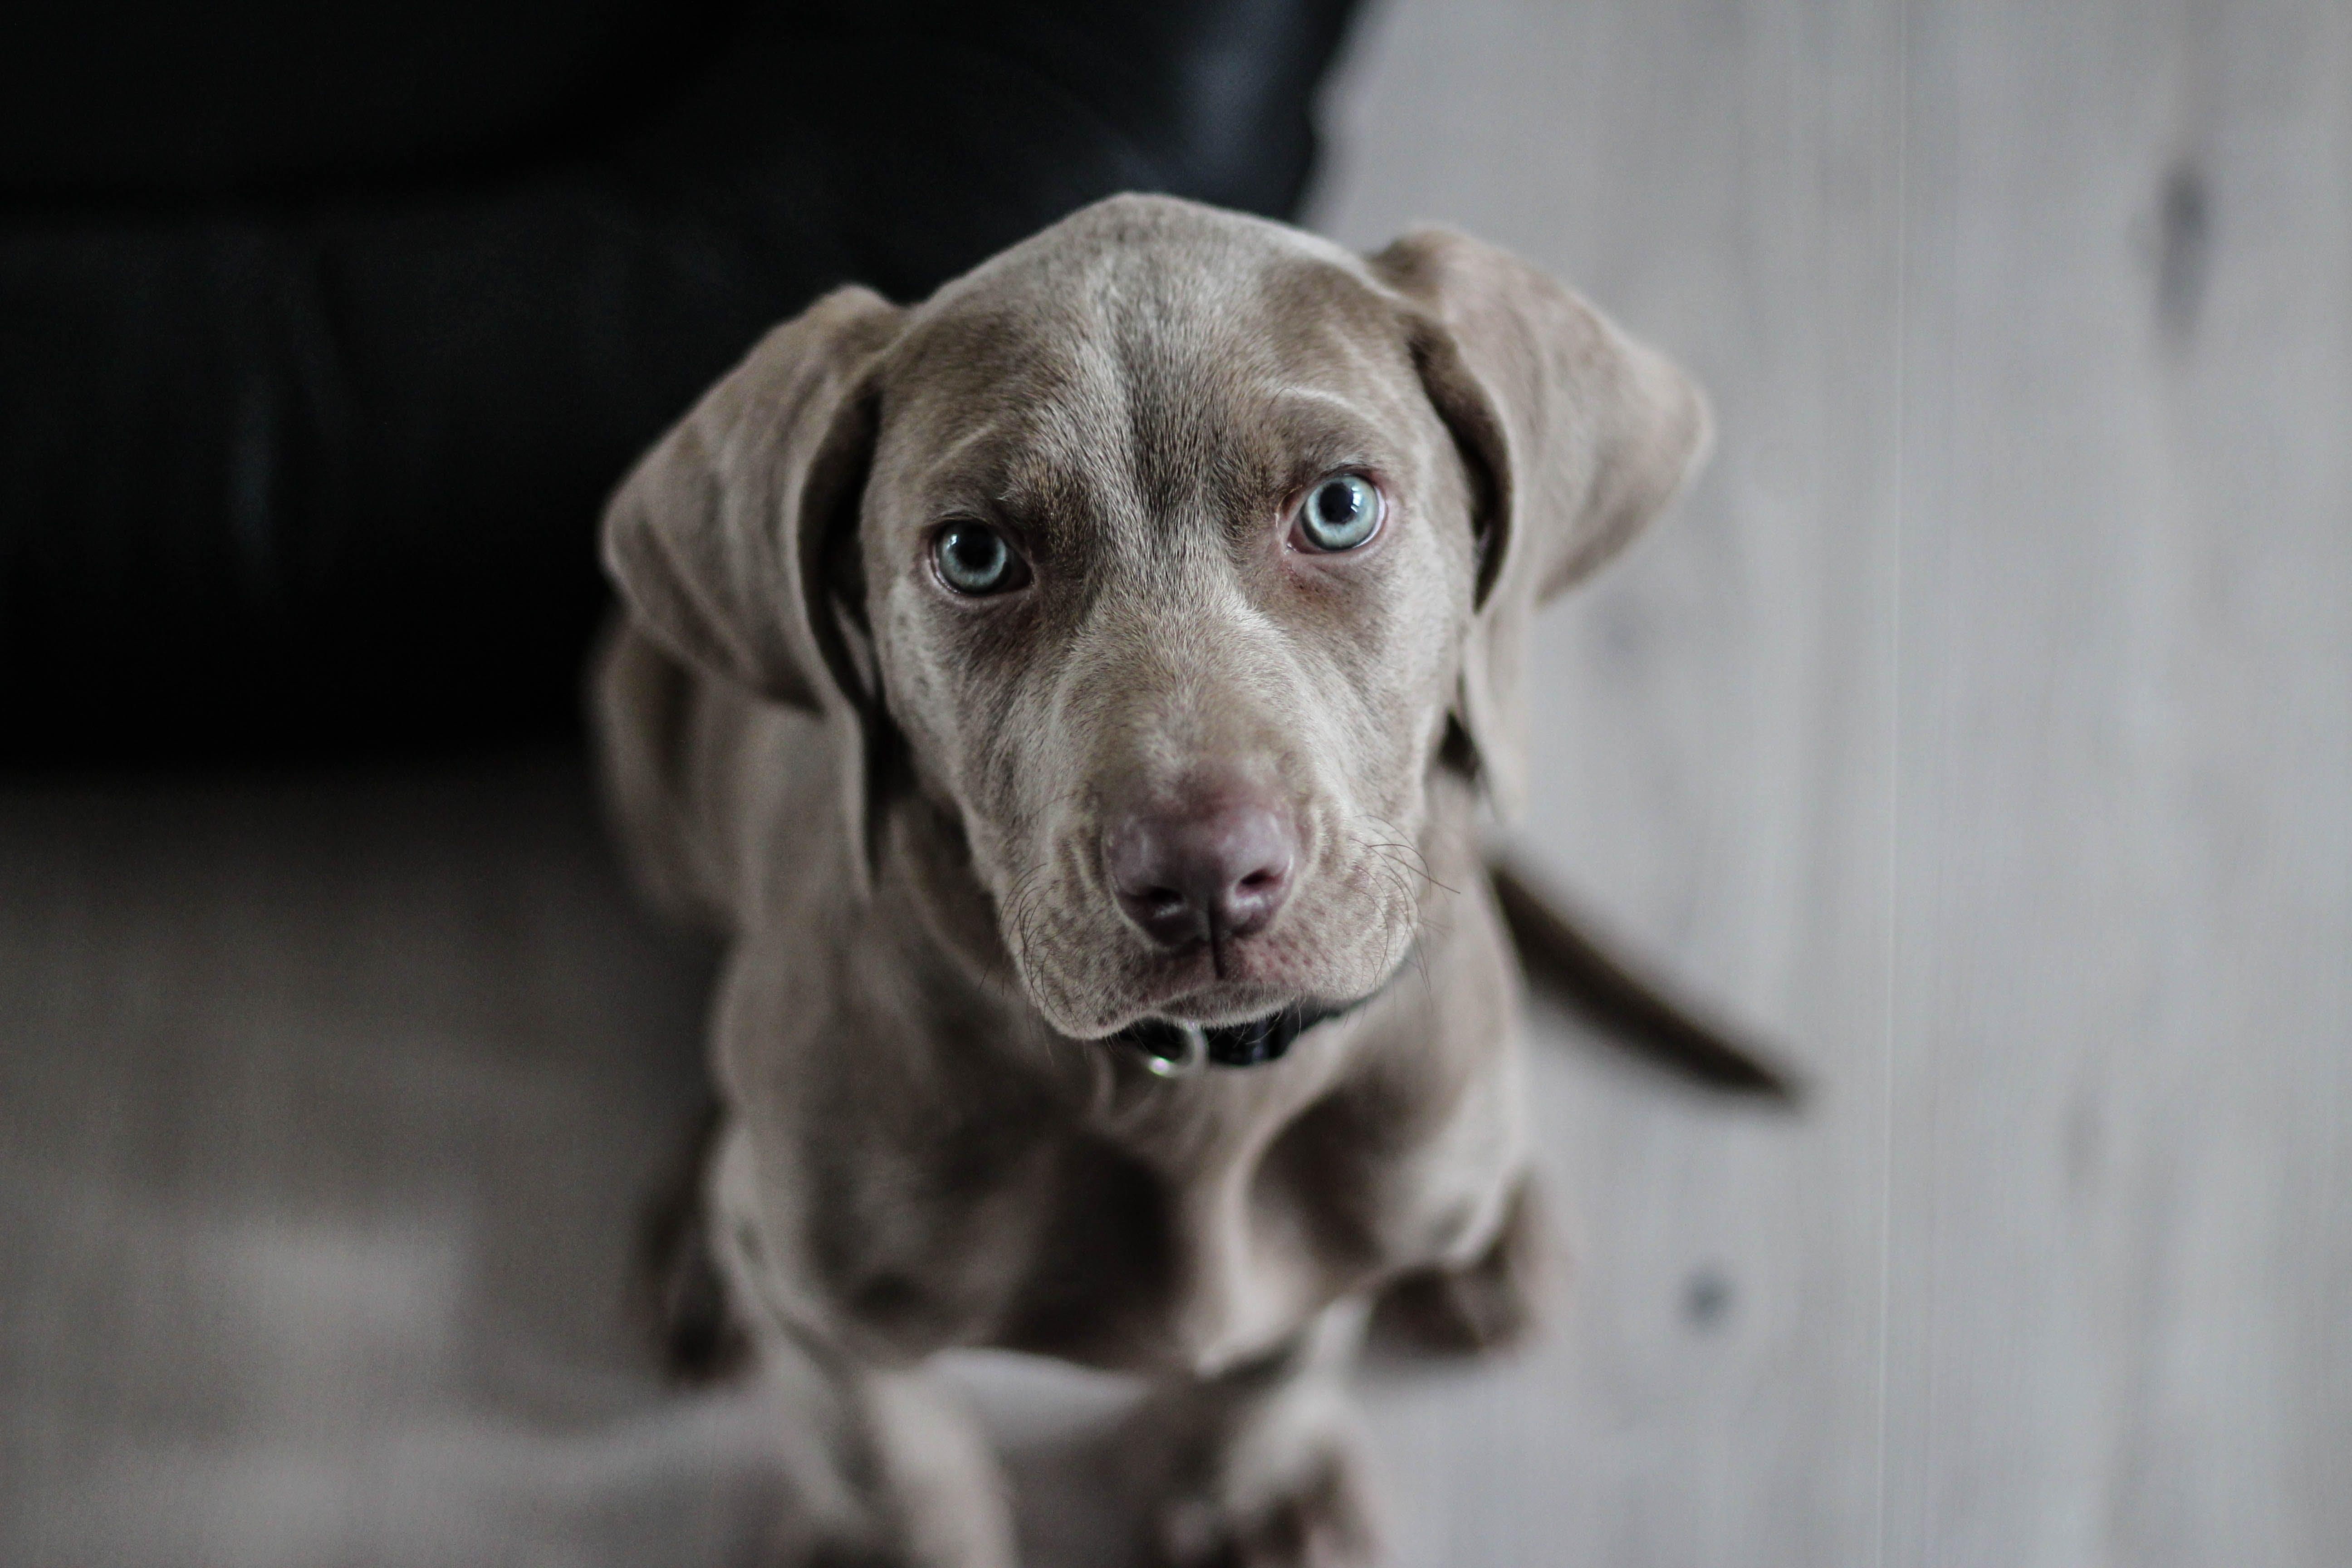 Black Short Coat Medium Dog on Floor